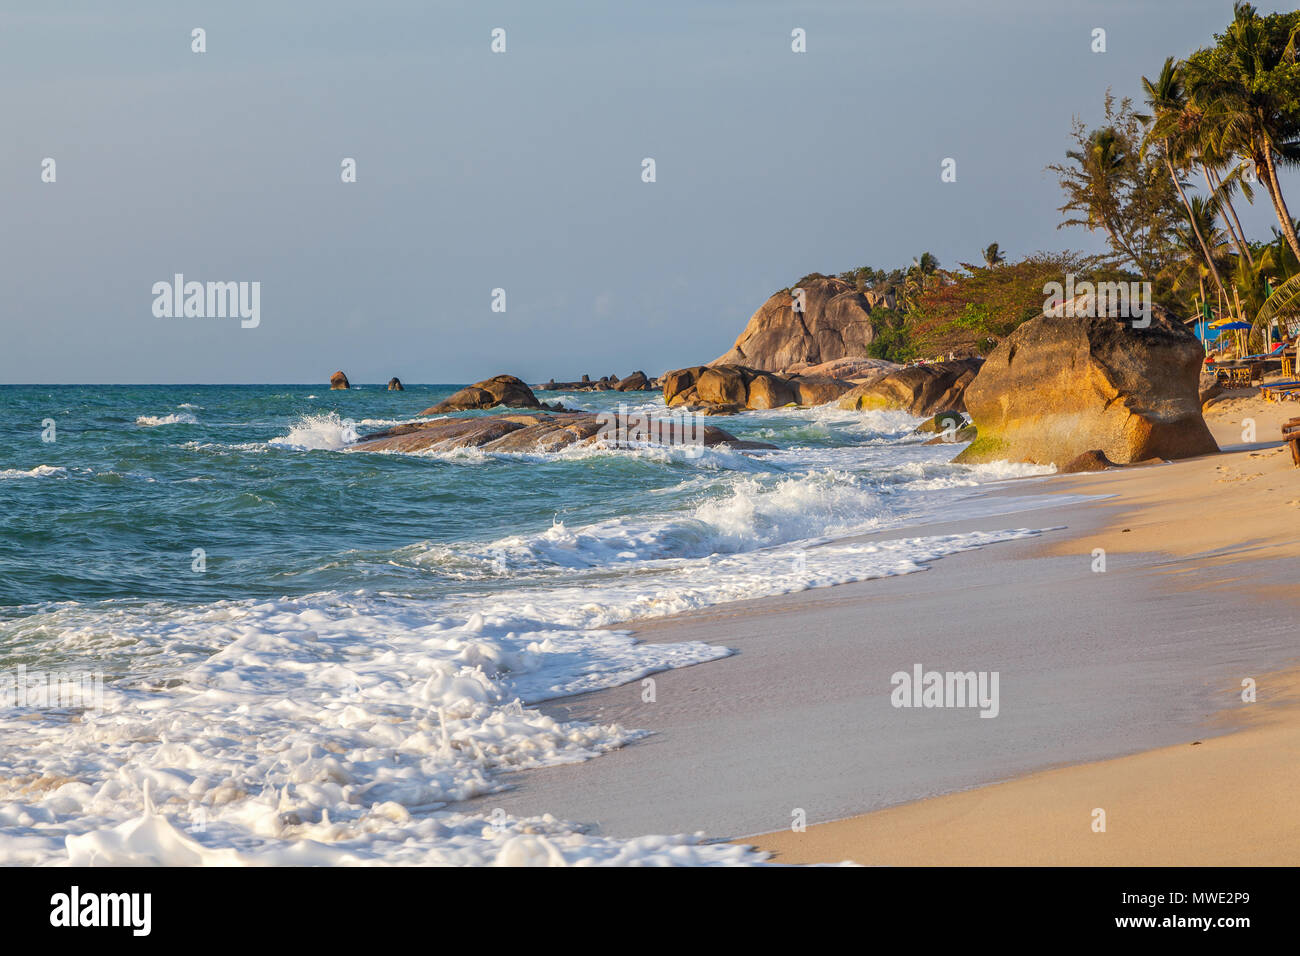 Morning on the island of Koh Samui - Stock Image